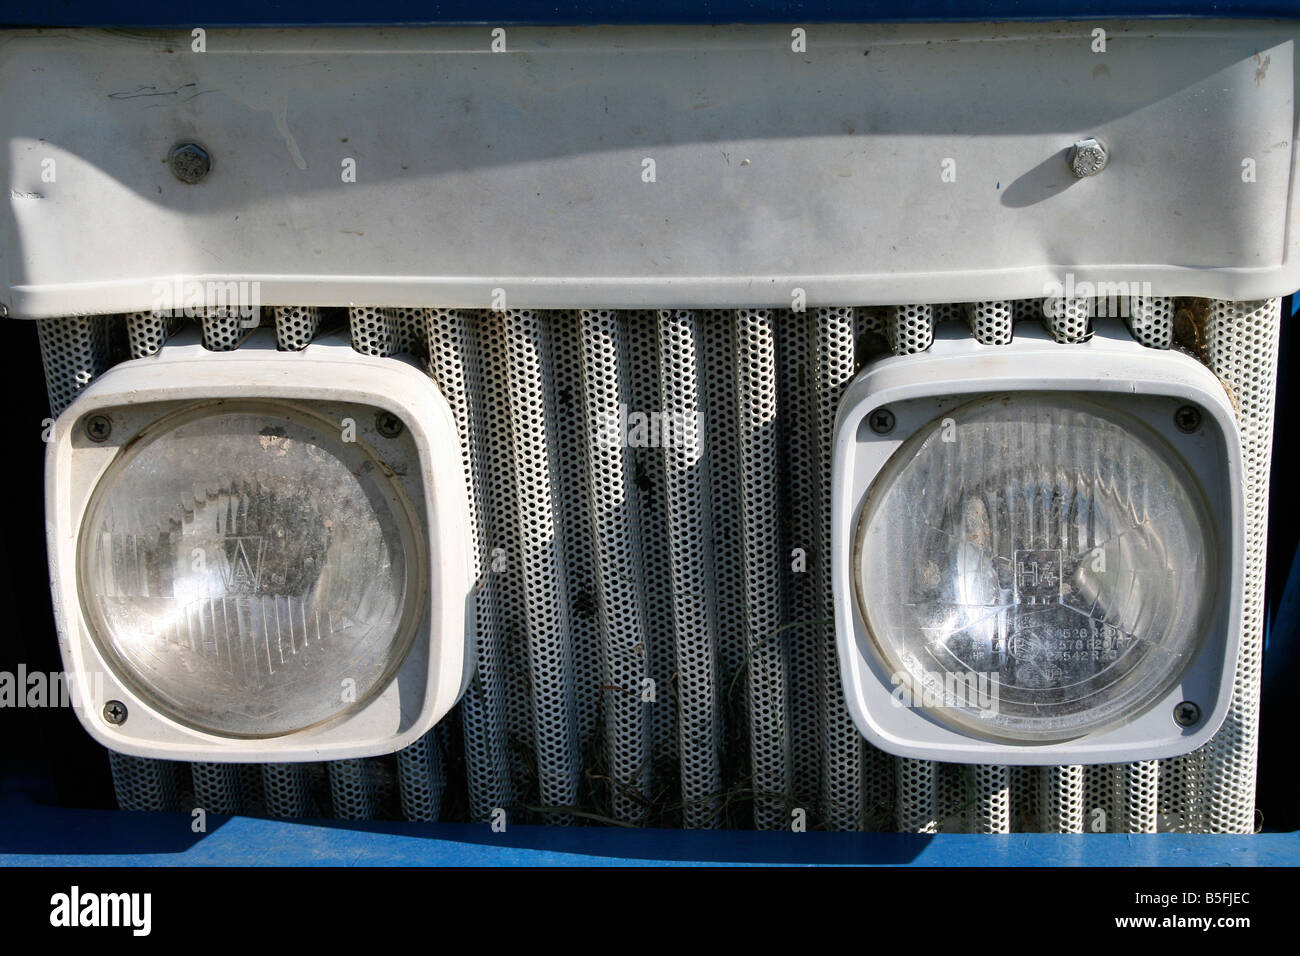 Tractor headlights - Stock Image